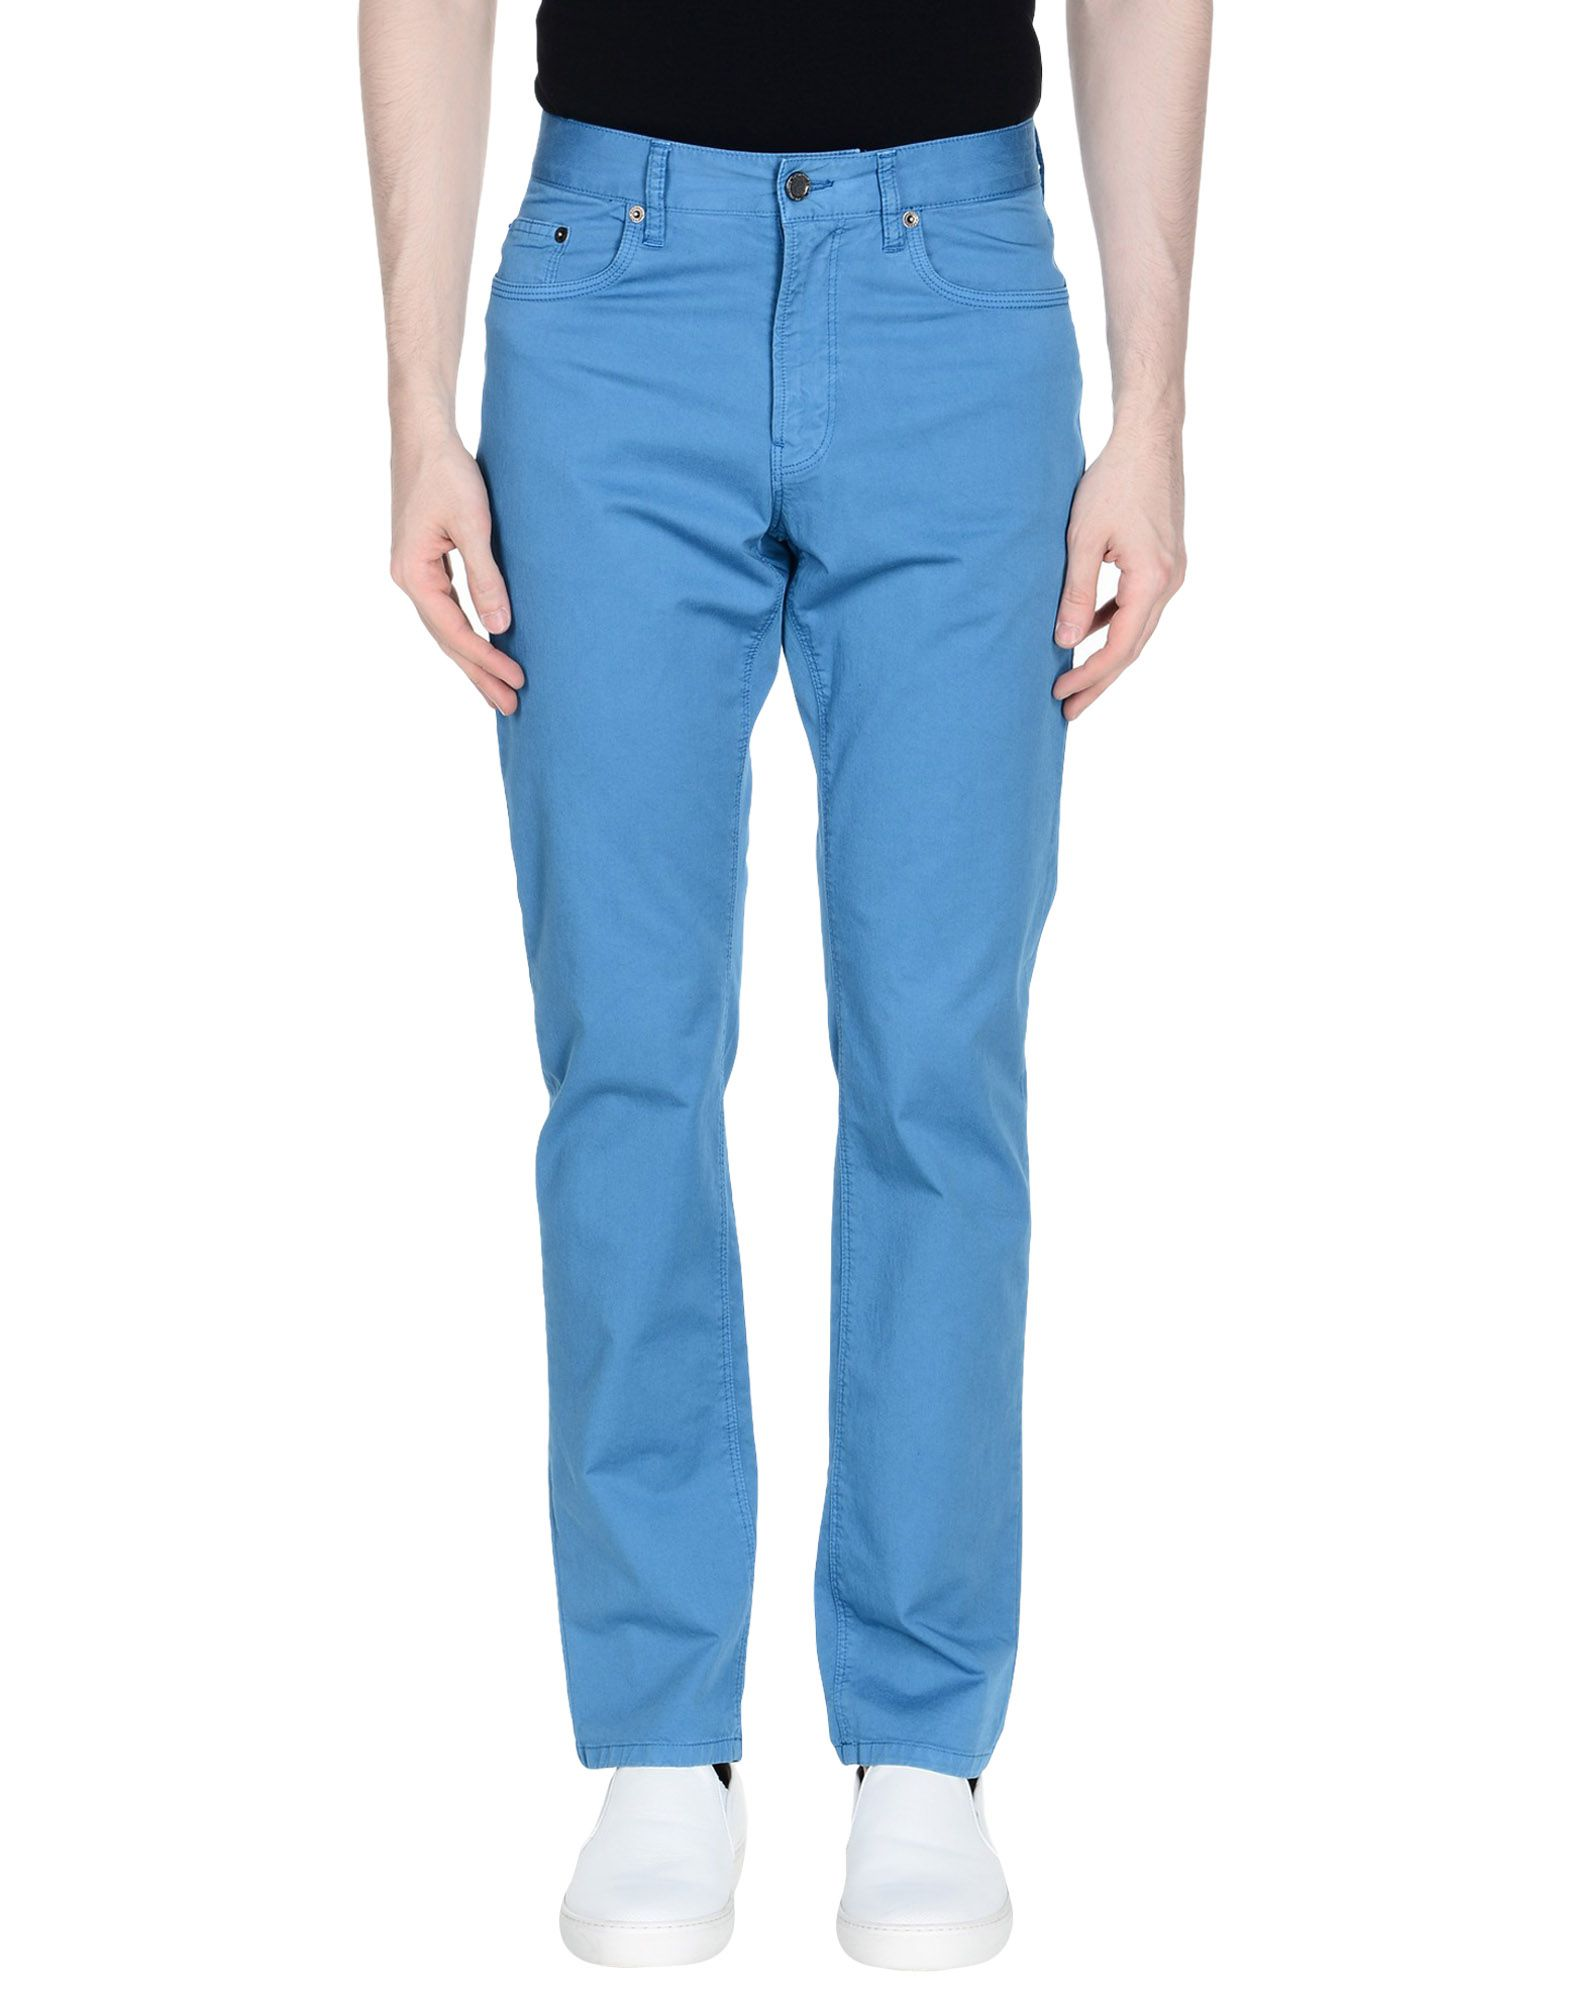 ASTON MARTIN RACING by HACKETT Повседневные брюки брюки синие aston martin ут 00007243